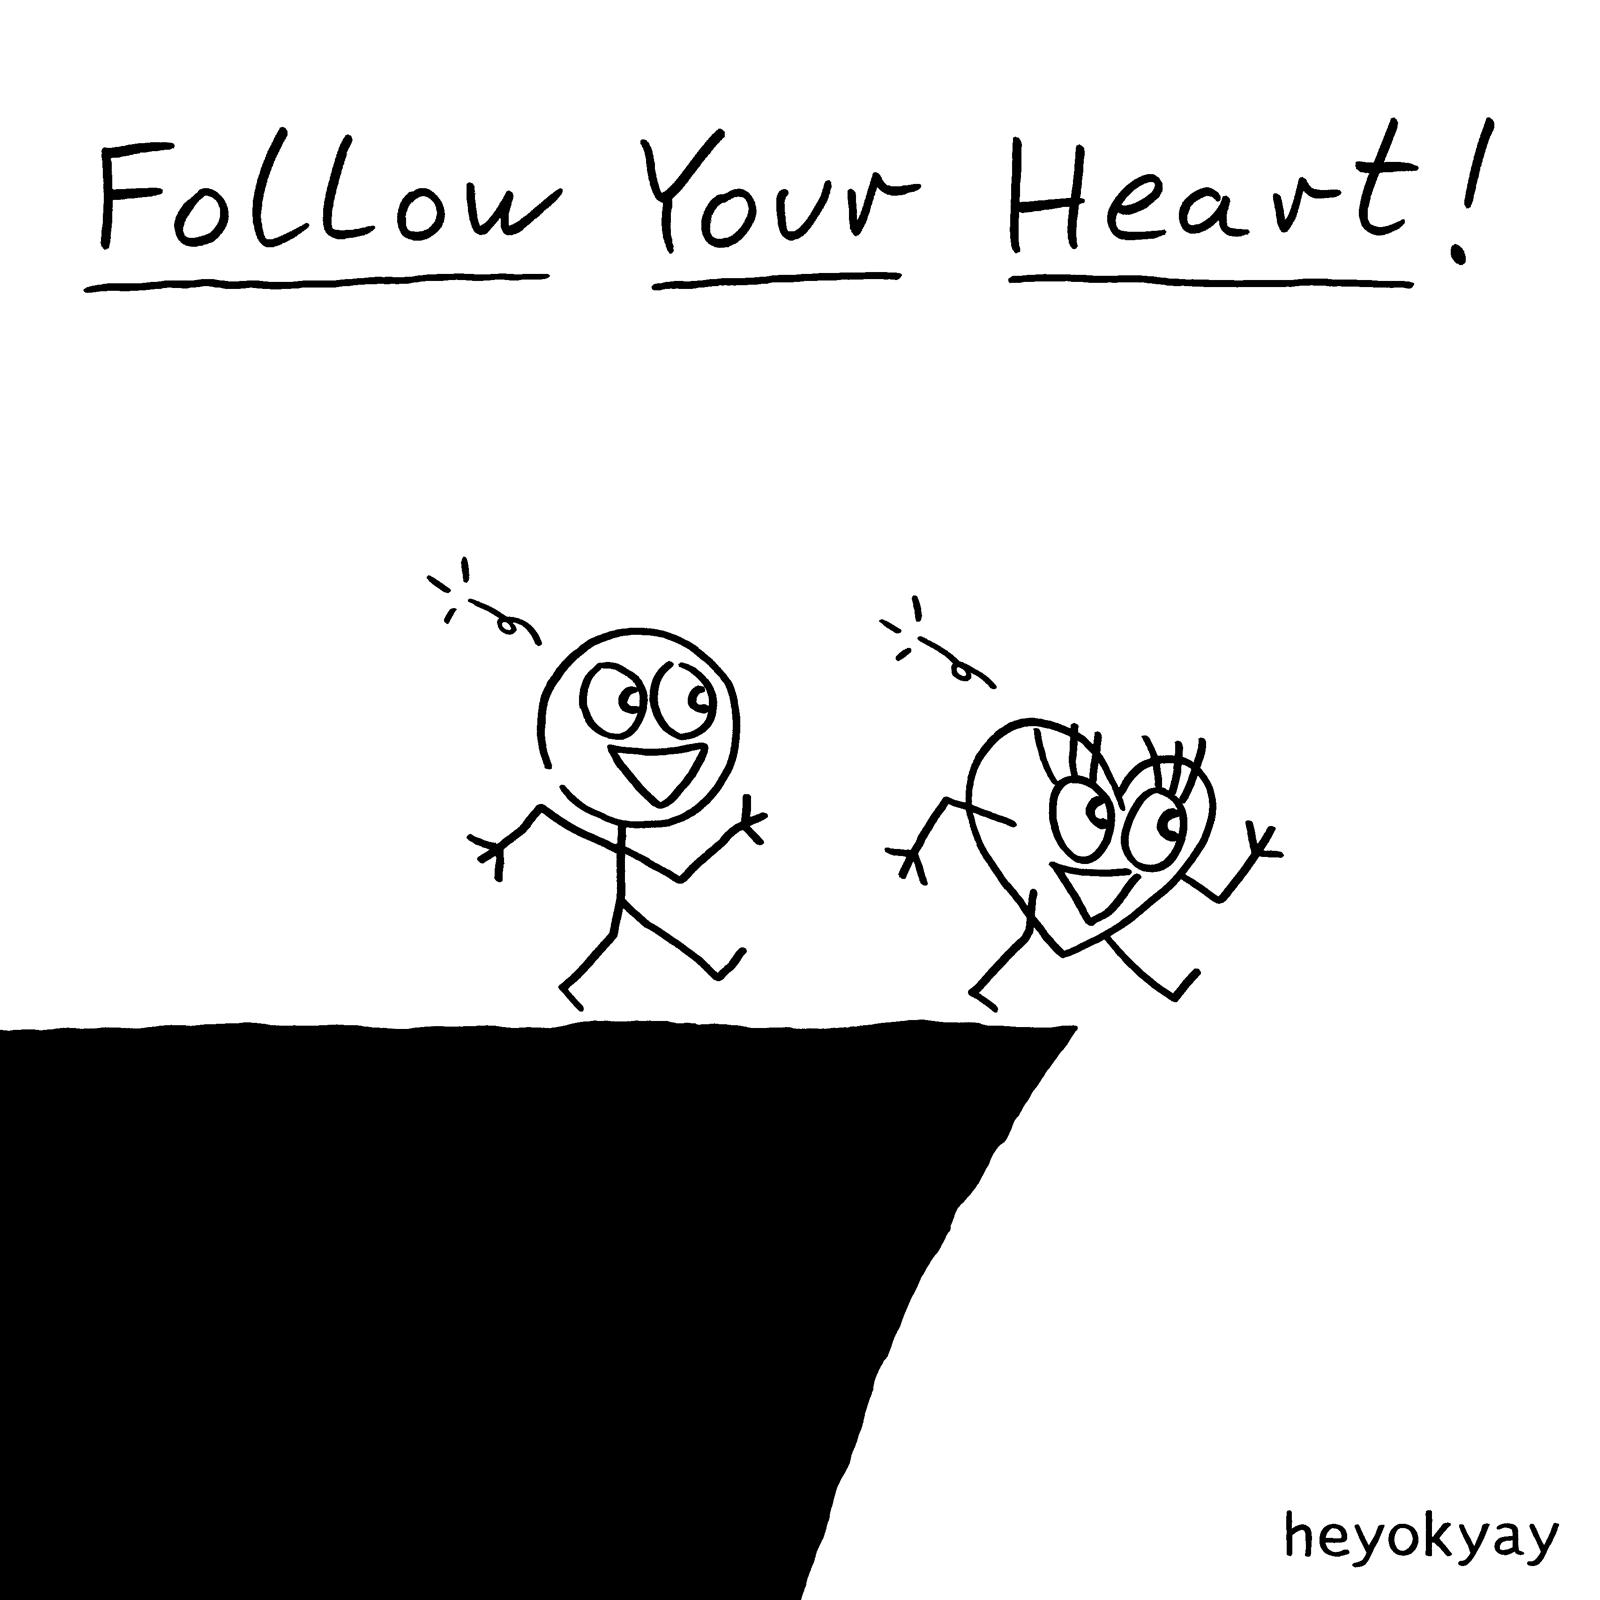 Follow your heart heyokyay comic